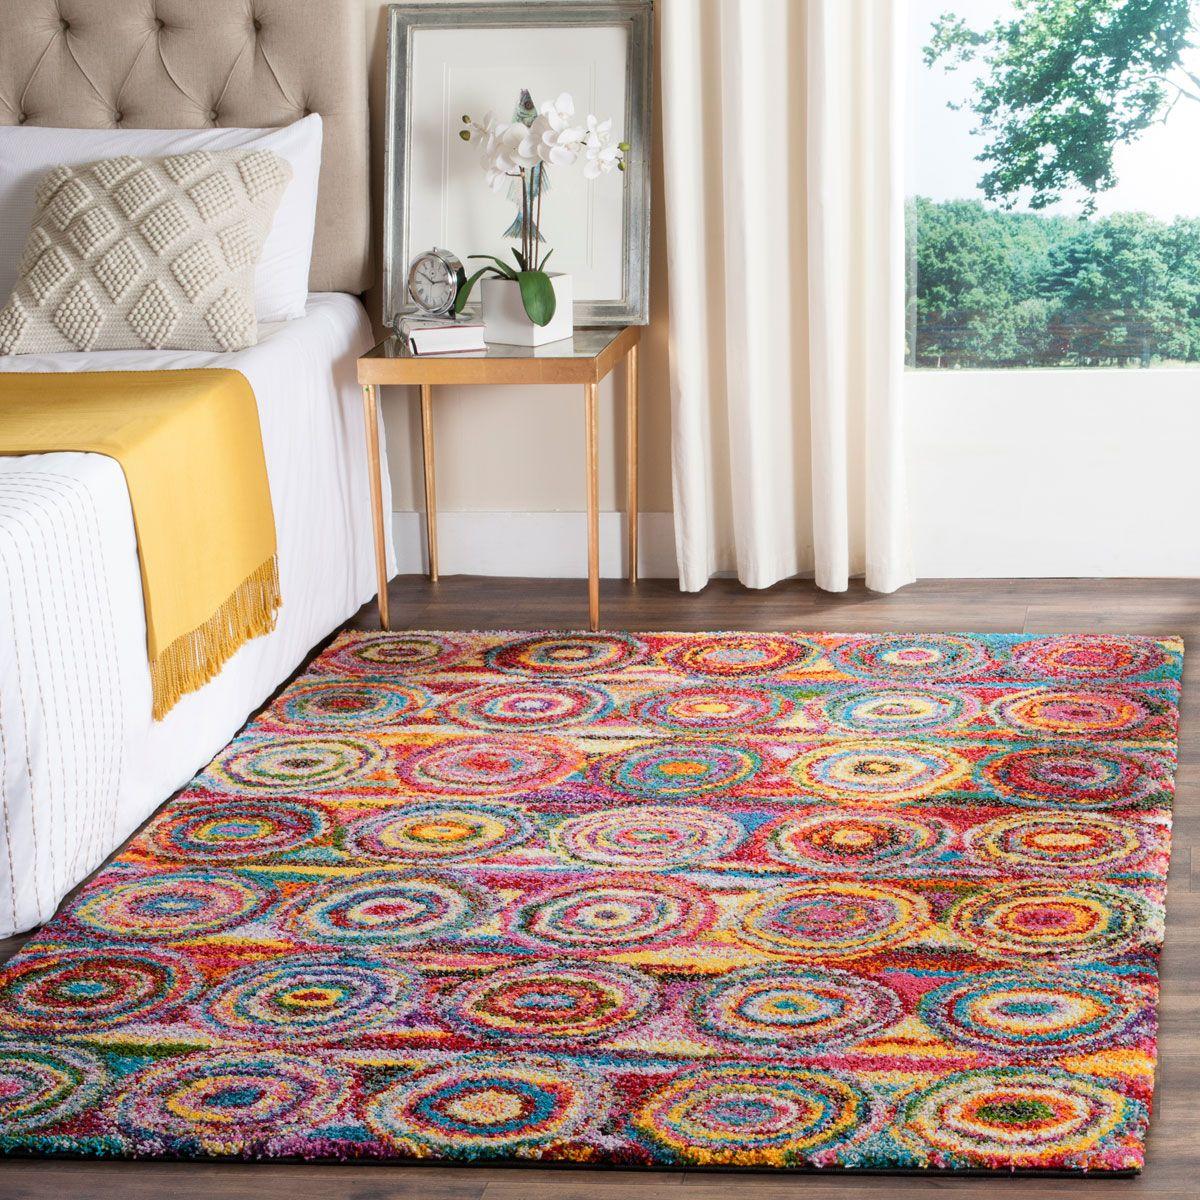 Shag Collection FSG359M Color: Multi  #rug #carpet #safavieh #safaviehrug  #trendy #homedecor #homeaccents #shophome #livingroom #diningroom #bedroom #kitchen #office #rugsforyourhome #shag #shagrug #shagcarpet #softshagrugs #shagrugdesign #stunningshagrugs #safaviehshag #safaviehshagrugs #trendyrugs #bestrugs #bestrugprices